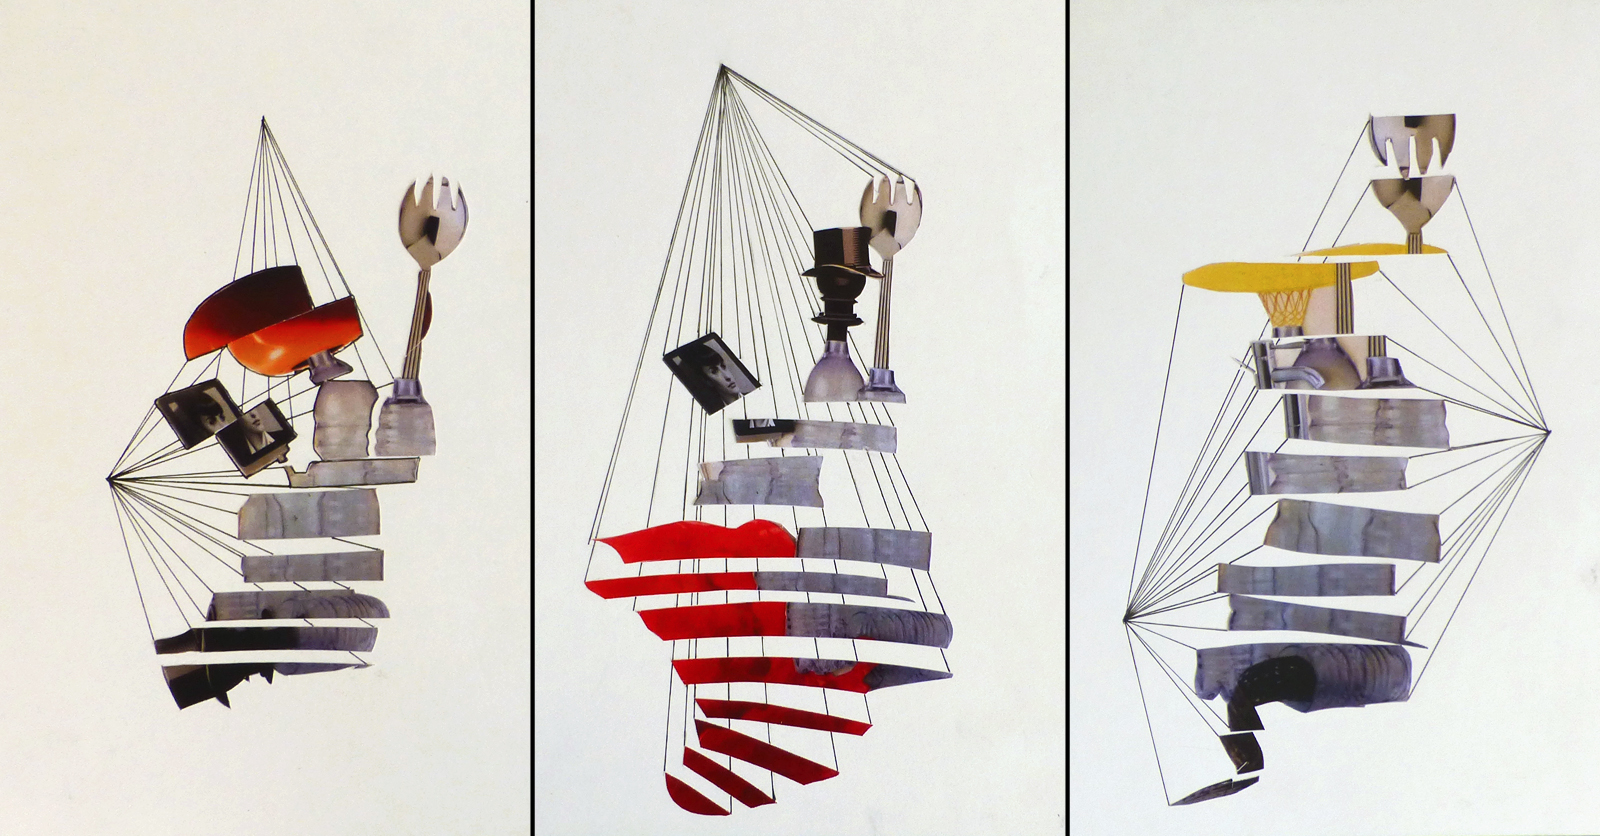 5.Collage Trio